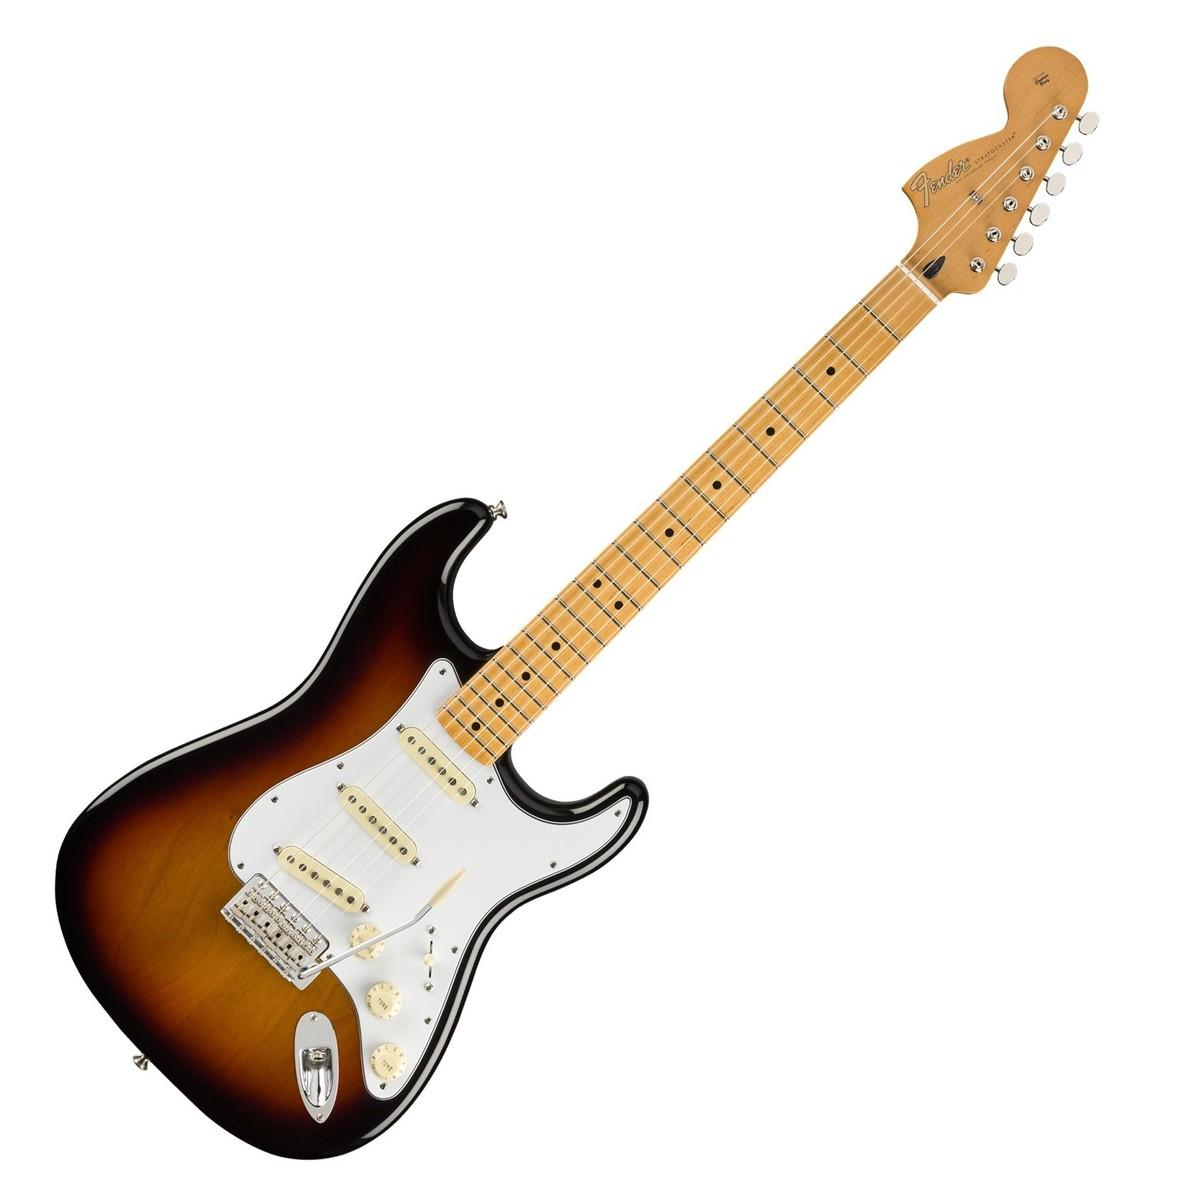 Jimi Hendrix Stratocaster : fender jimi hendrix stratocaster mn 3 tone sunburst at gear4music ~ Vivirlamusica.com Haus und Dekorationen